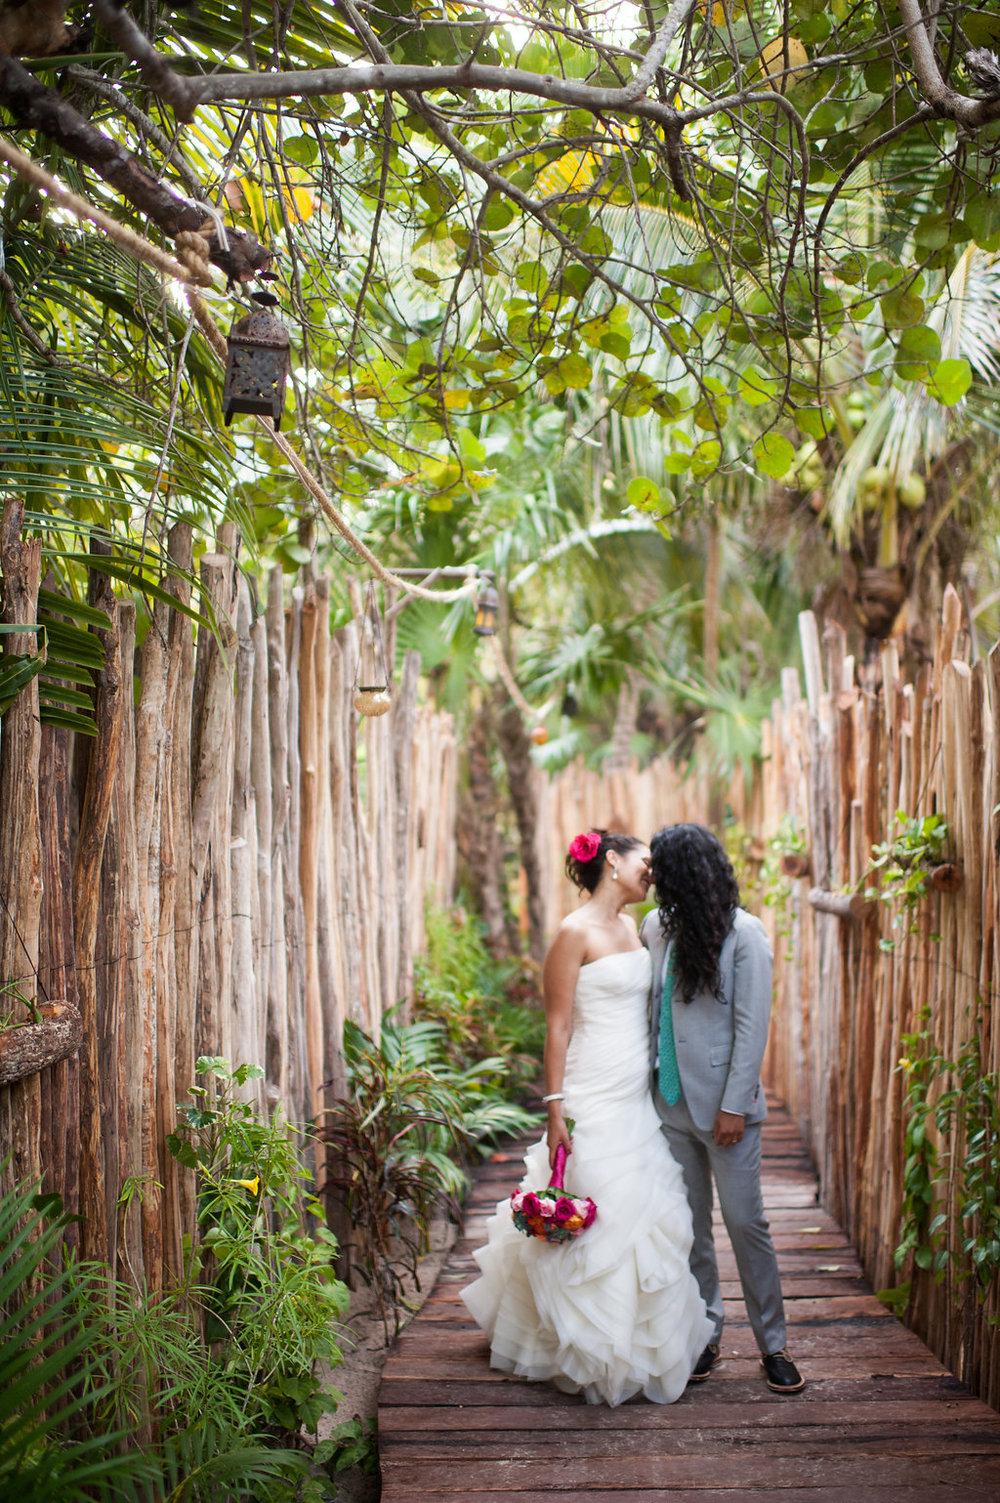 tulum-mexico-wedding-photographer-21.jpg